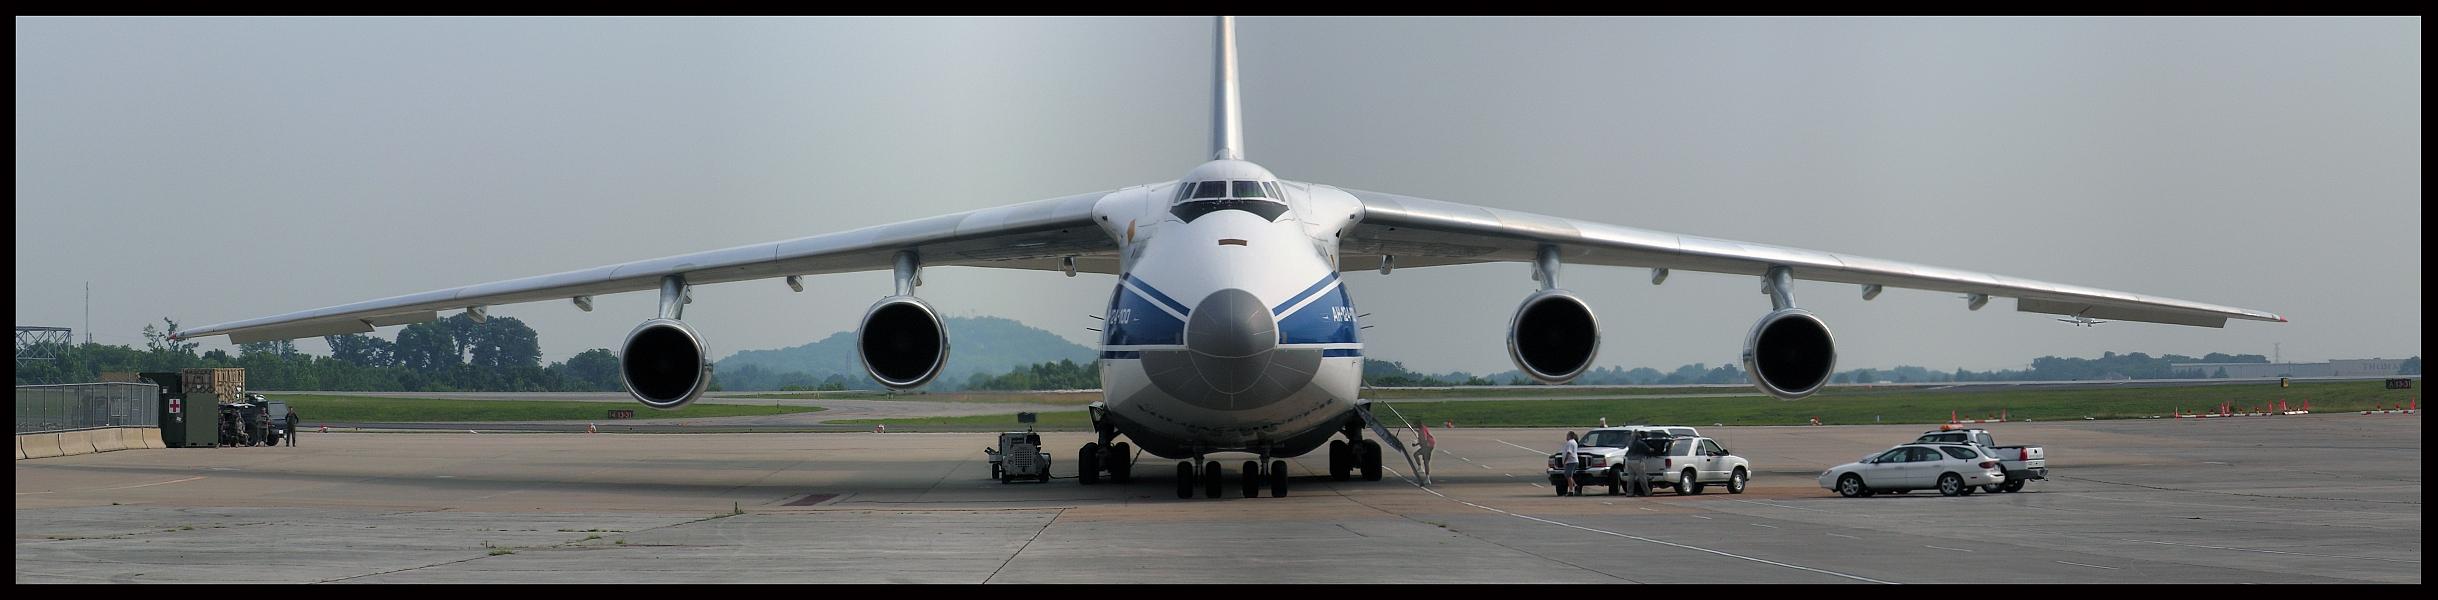 Volga Dnepr Airlines Antonov-124 **Panoramic**